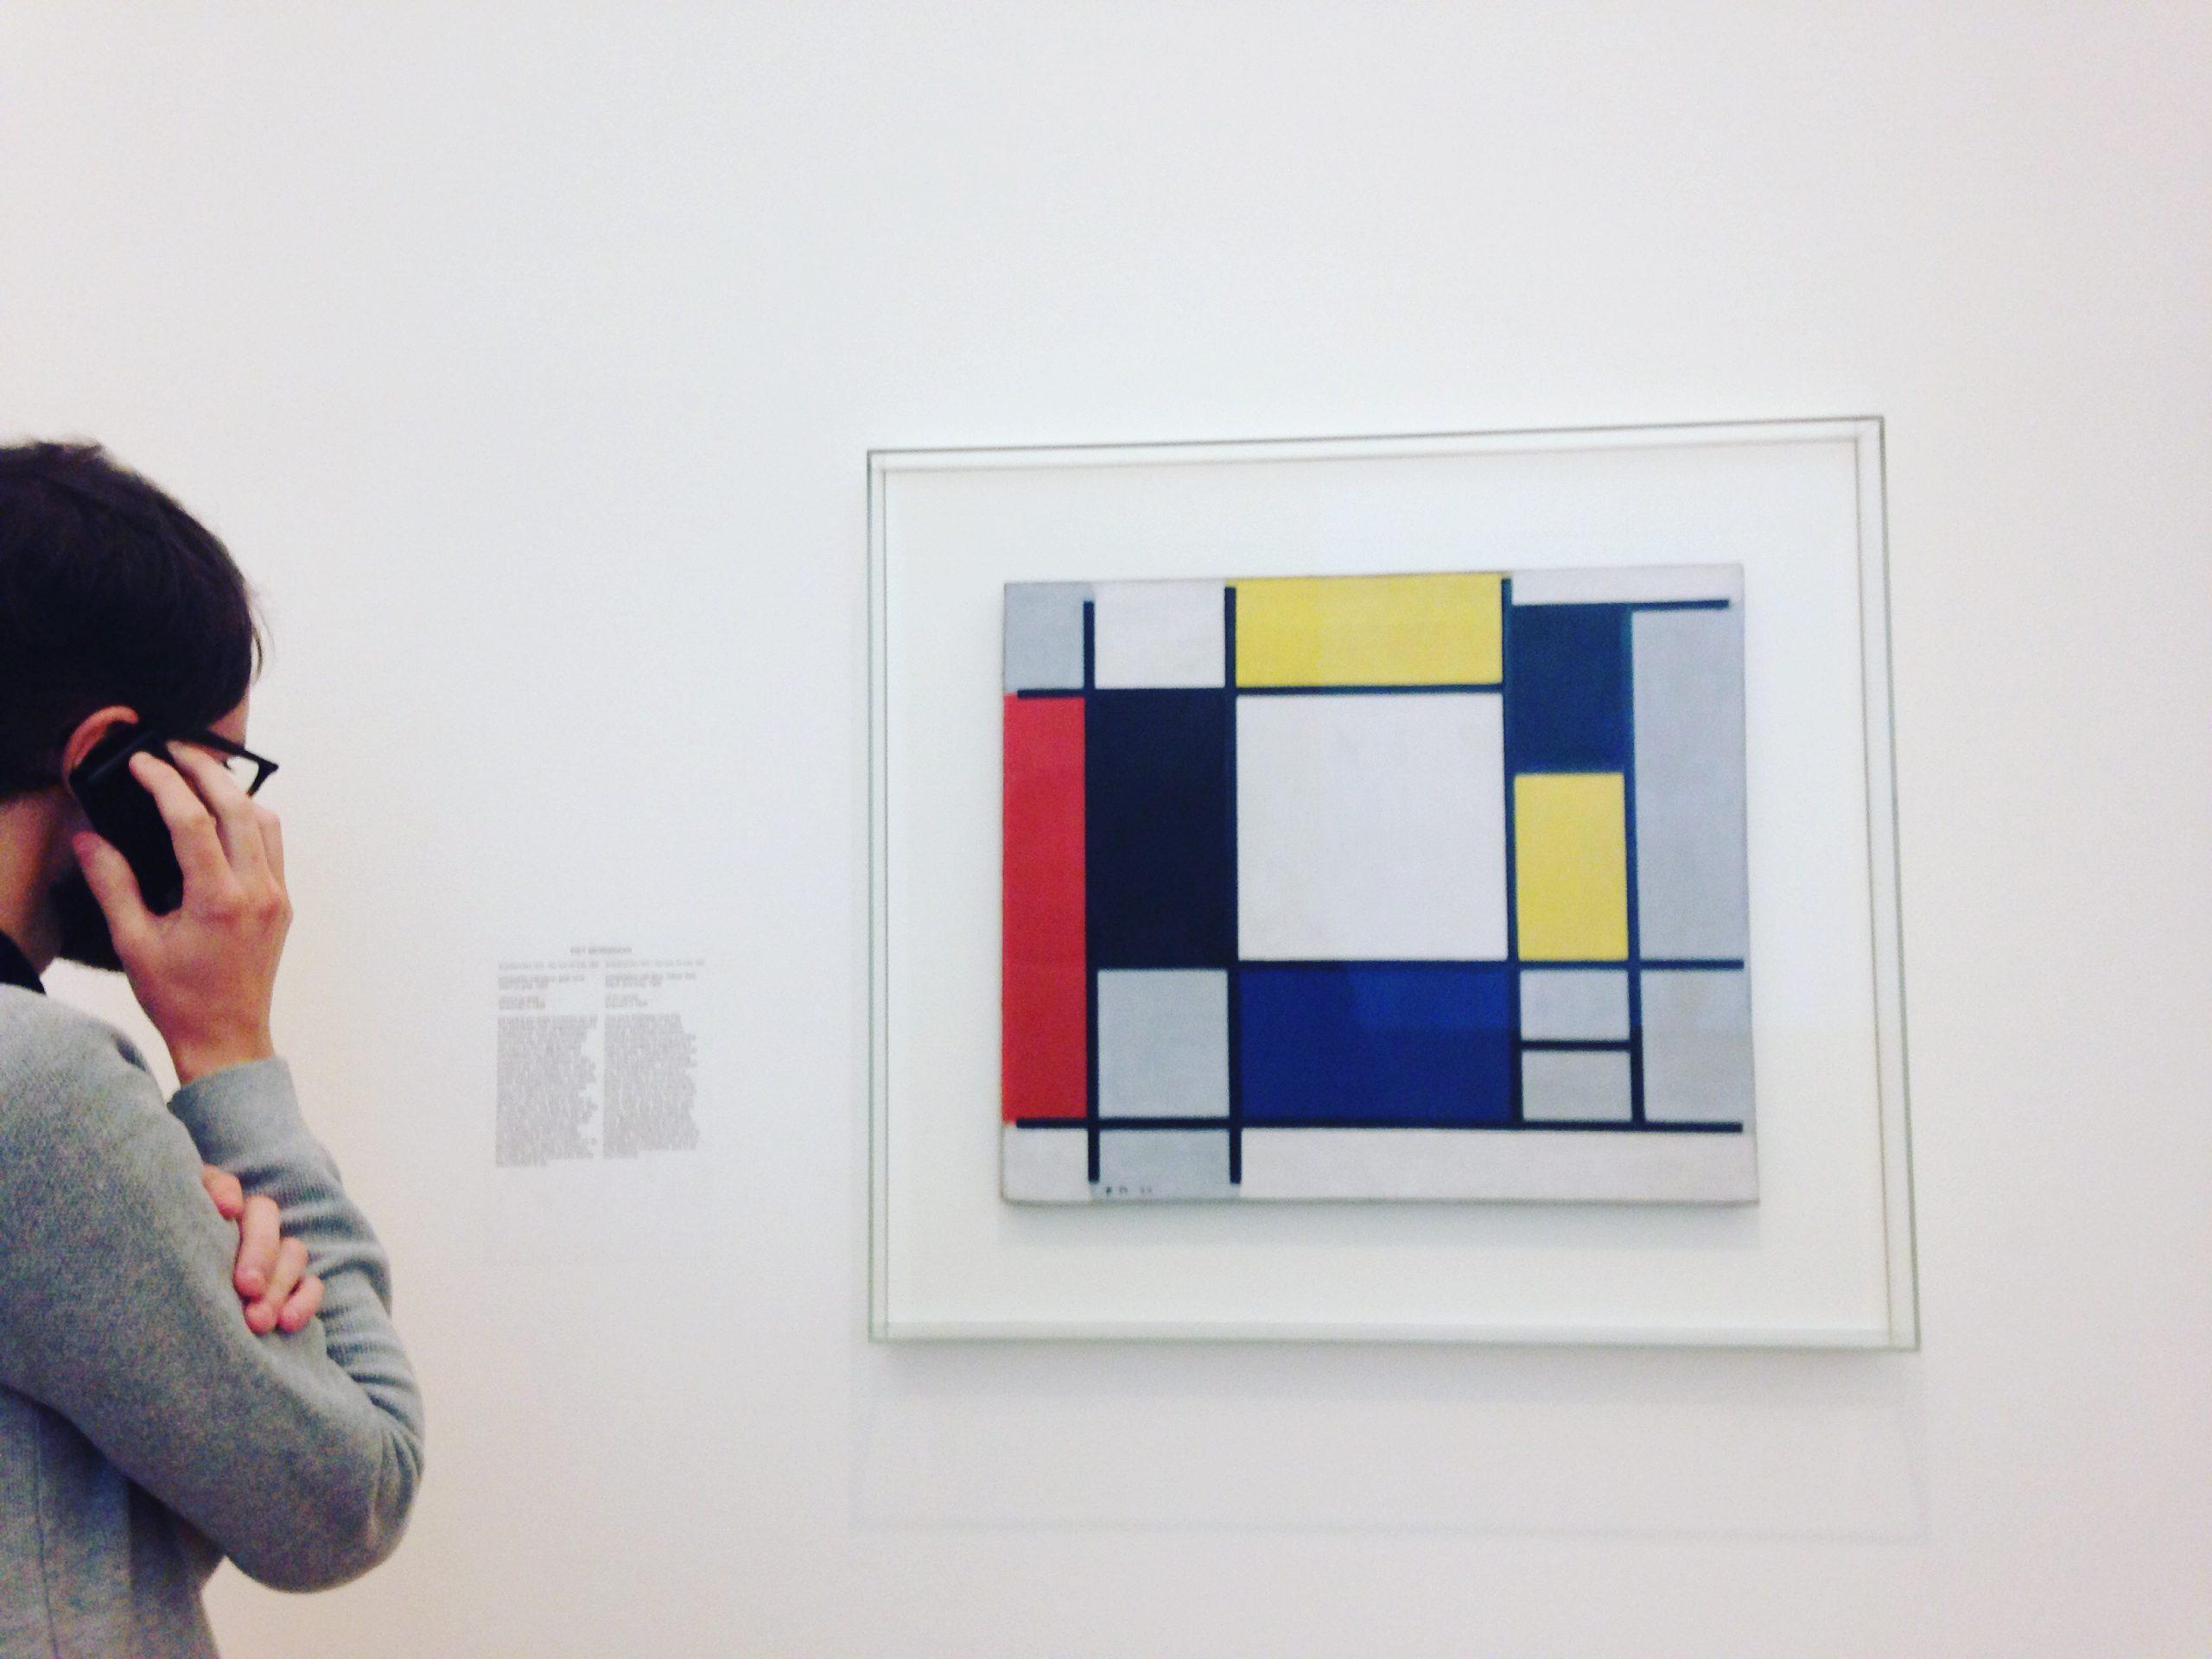 Tableau de Piet Mondriaan au Stedelijk Museum d'Amsterdam